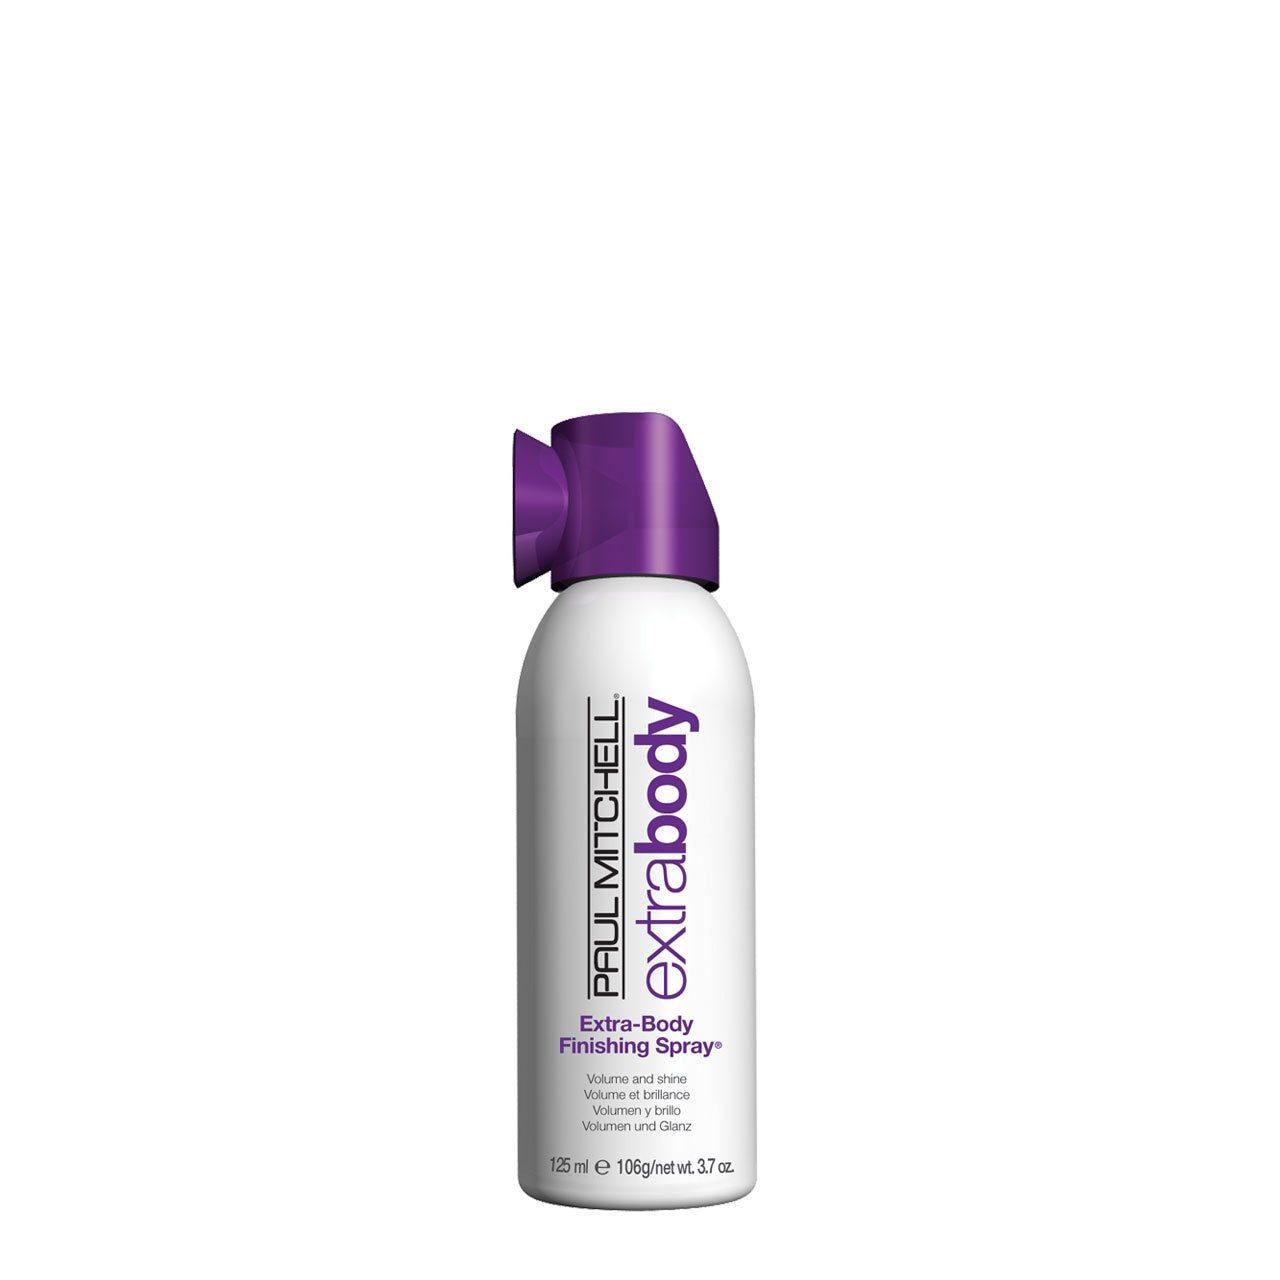 Extra body finishing spray3